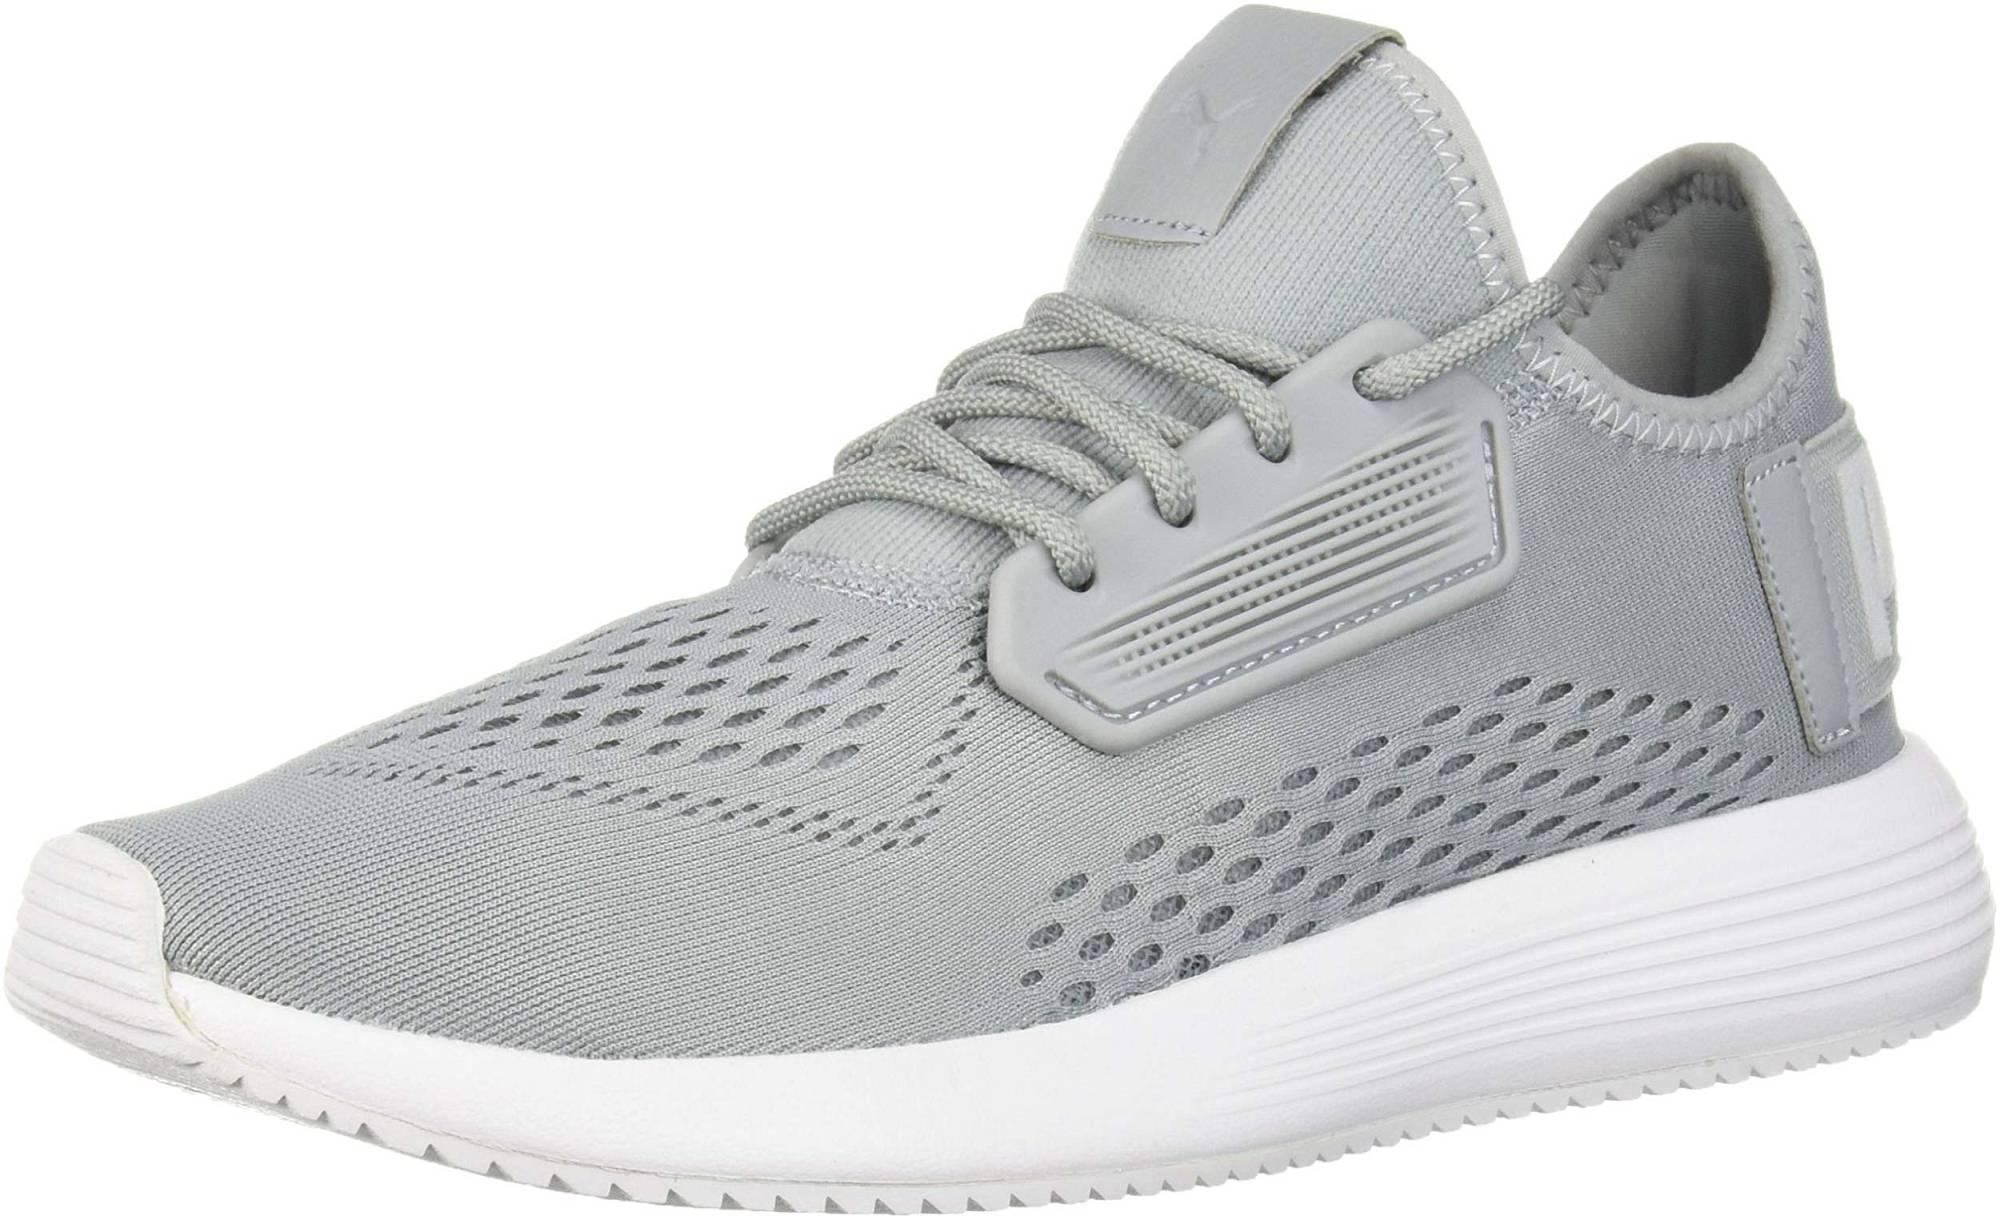 Puma Uprise Mesh – Shoes Reviews